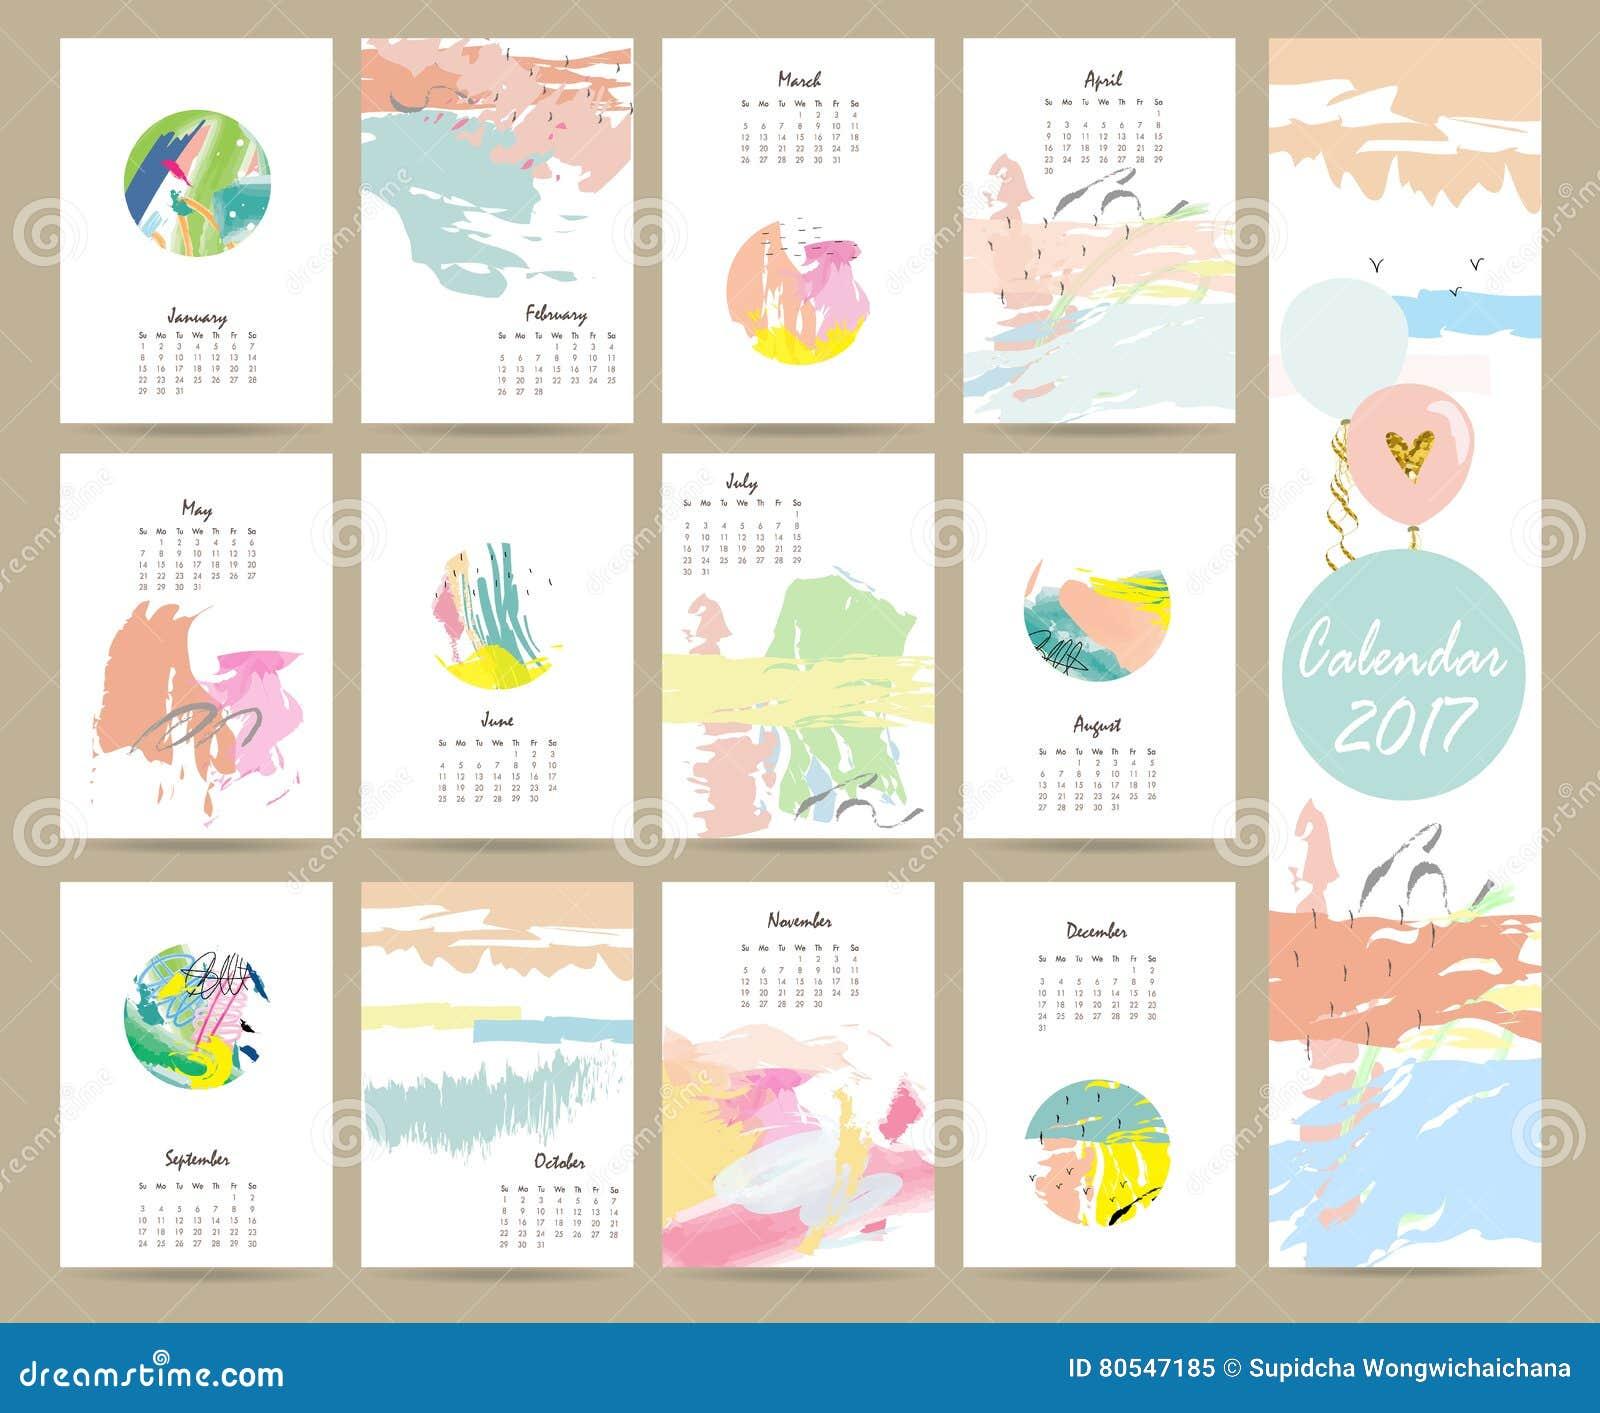 Calendario Mensual Lindo Colorido 2017 Con Color Rosado, Azul, Verde ...